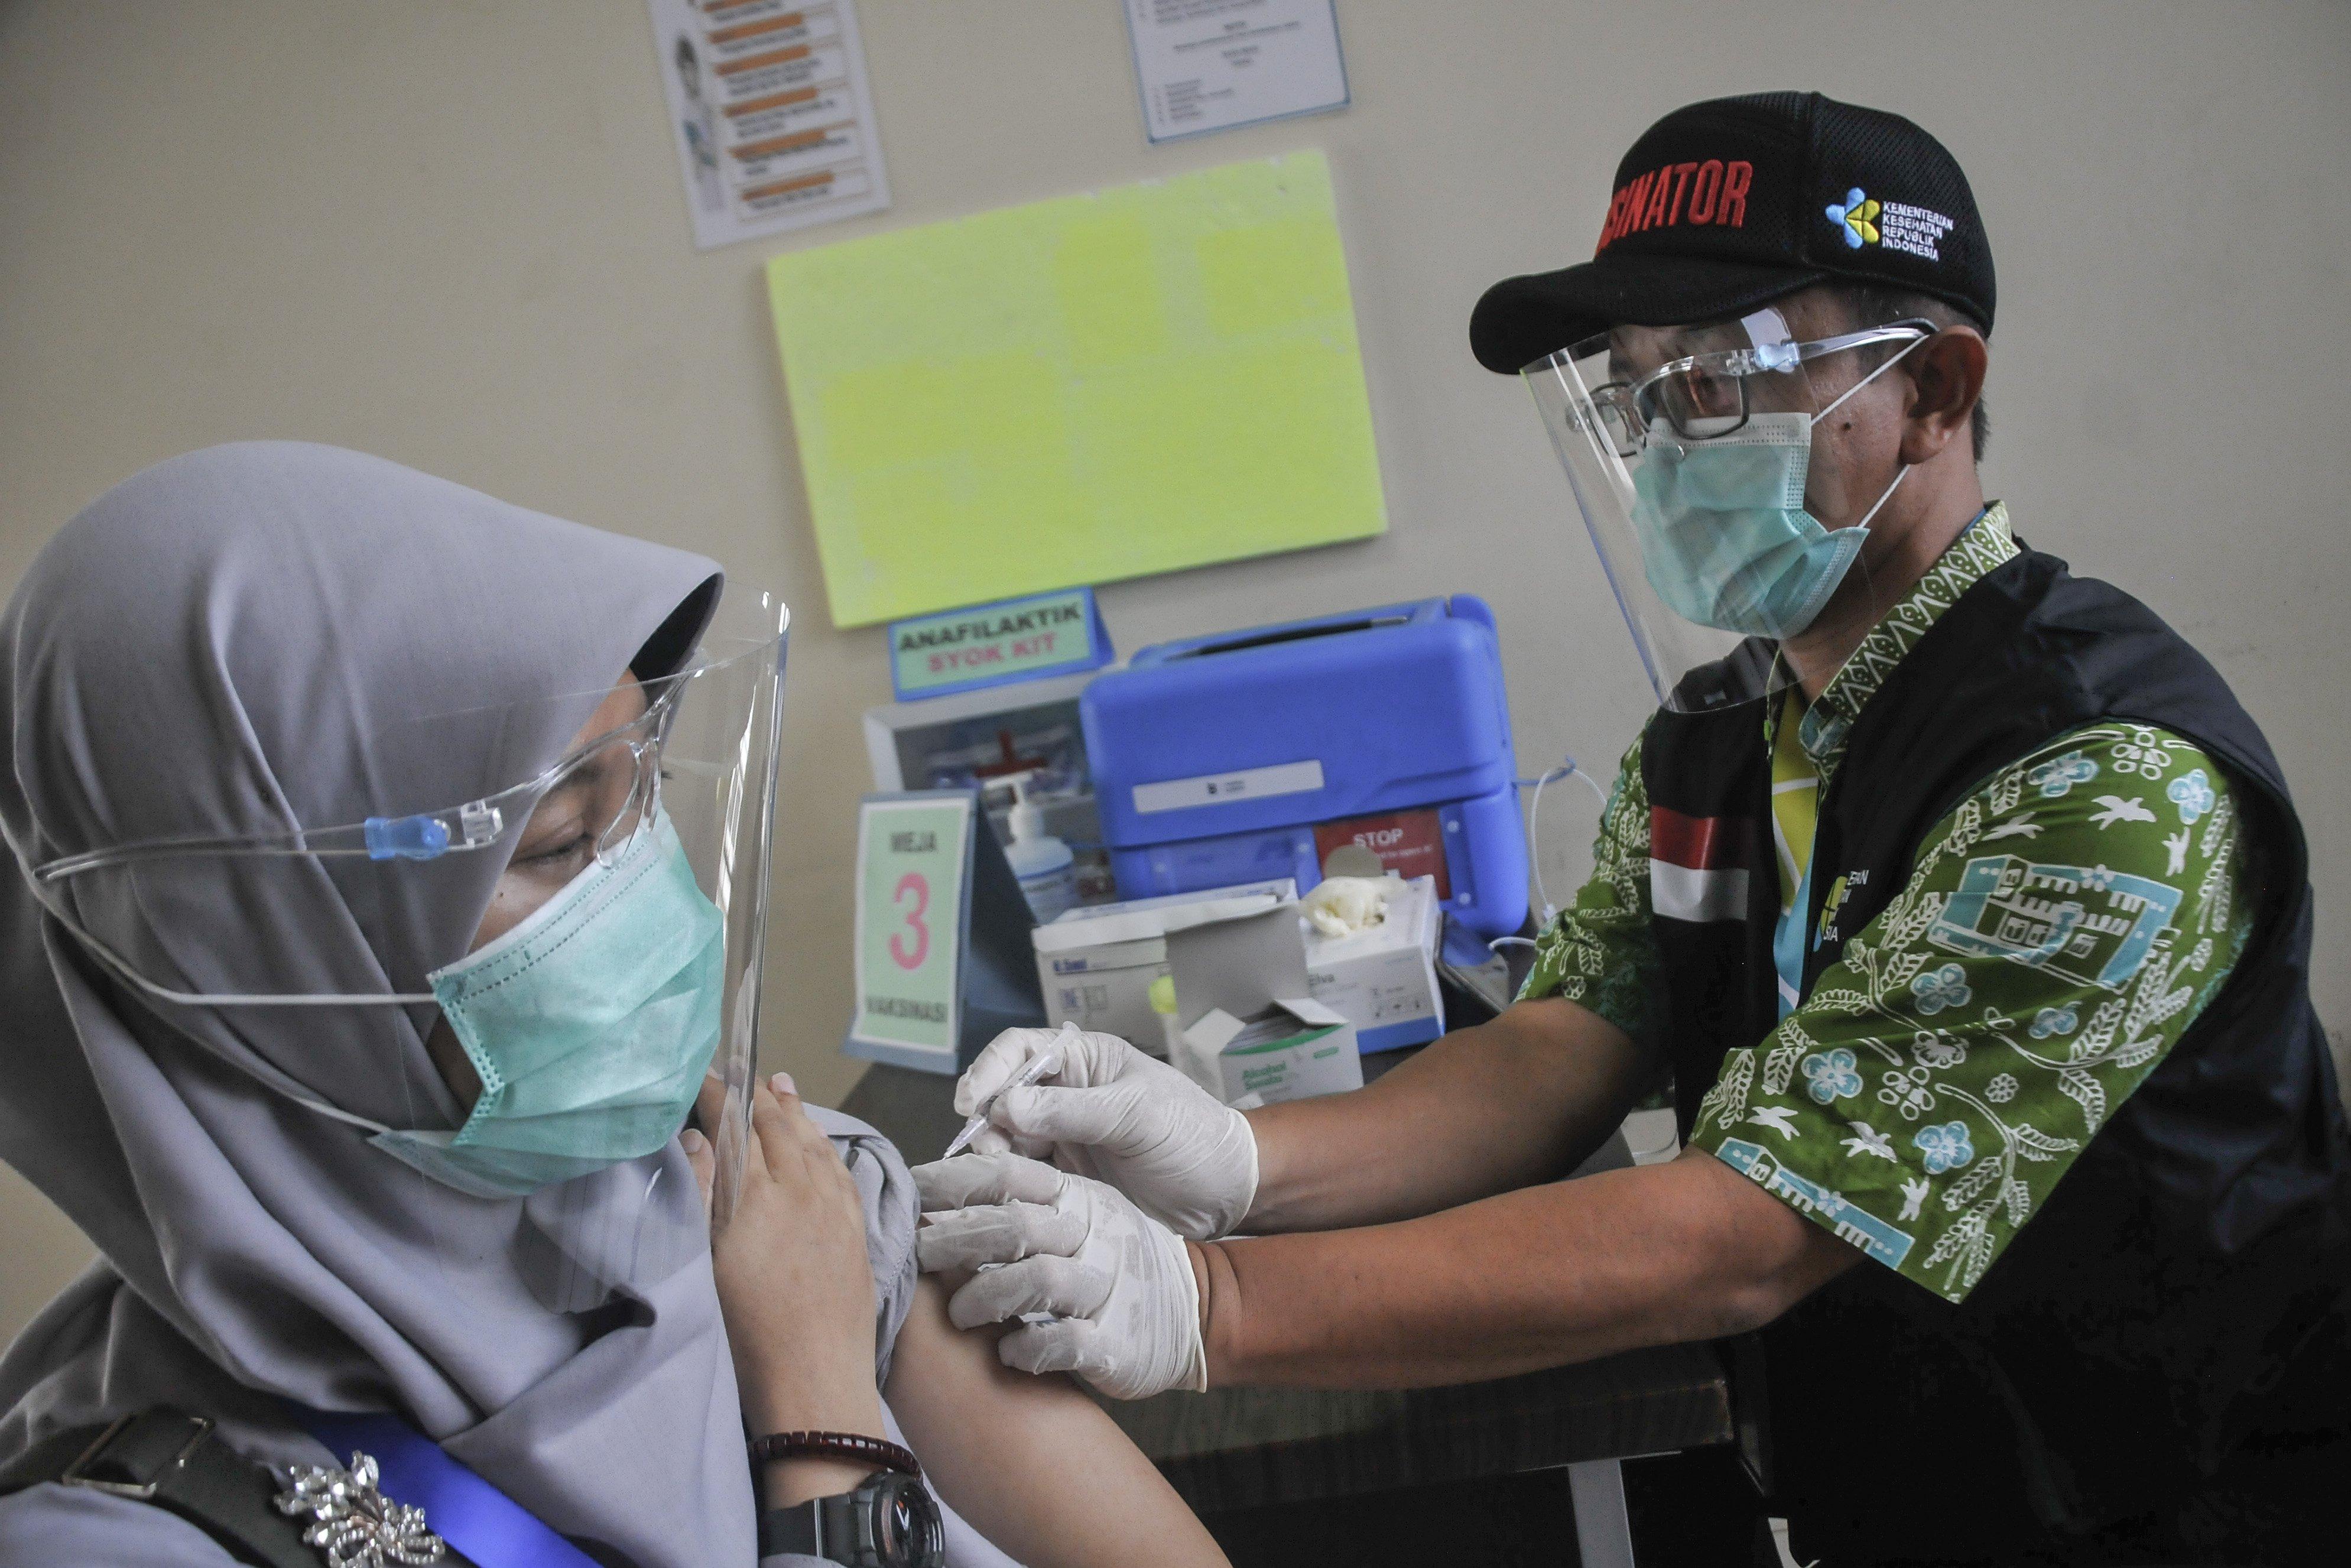 Petugas medis (kanan) menyimulasikan pemberian vaksin COVID-19 di Puskesmas Cikarang, Kabupaten Bekasi, Jawa Barat, Kamis (19/11/2020). Simulasi vaksinasi COVID-19 tersebut merupakan bagian dari upaya pemerintah menyampaikan sosialisasi tentang vaksin COVID-19 yang saat ini masih dalam tahap uji klinis.